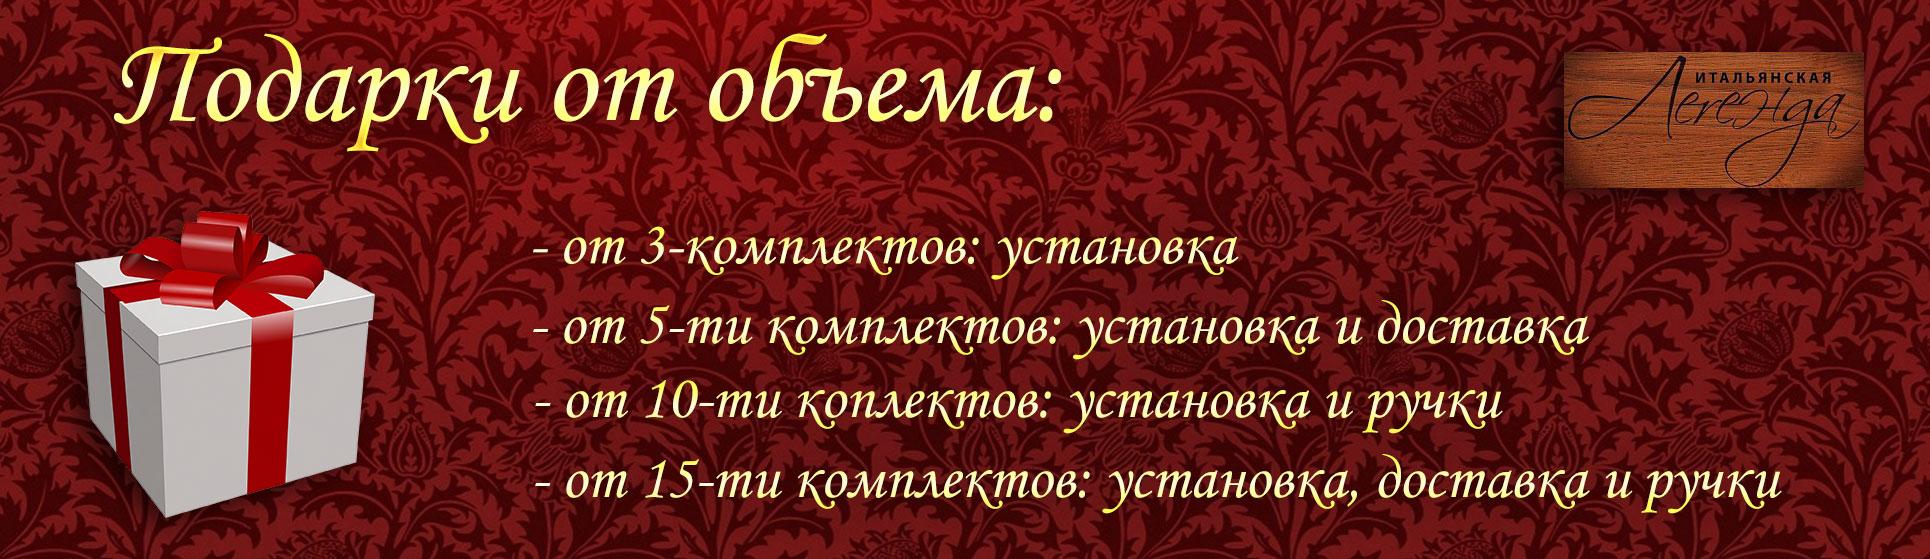 skidki-ot-obema-it-legenda